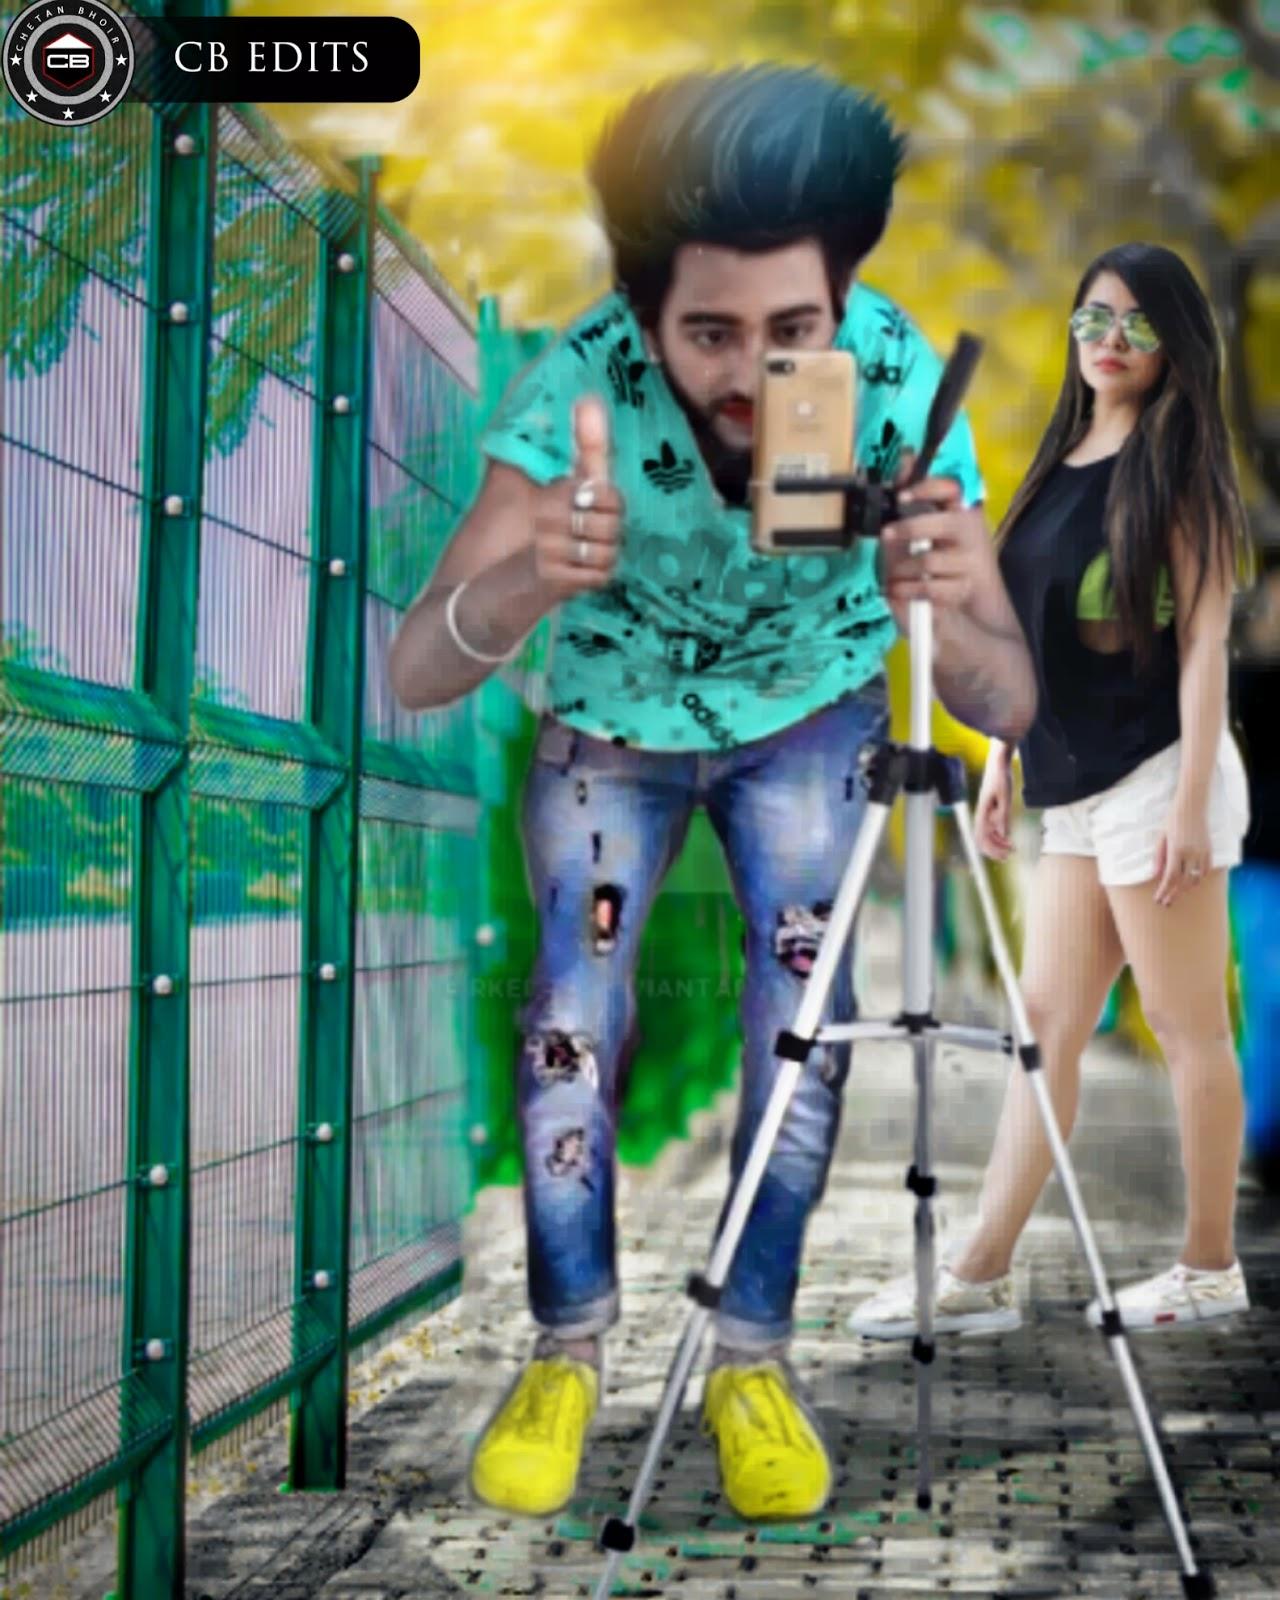 Bilal Swag Editing